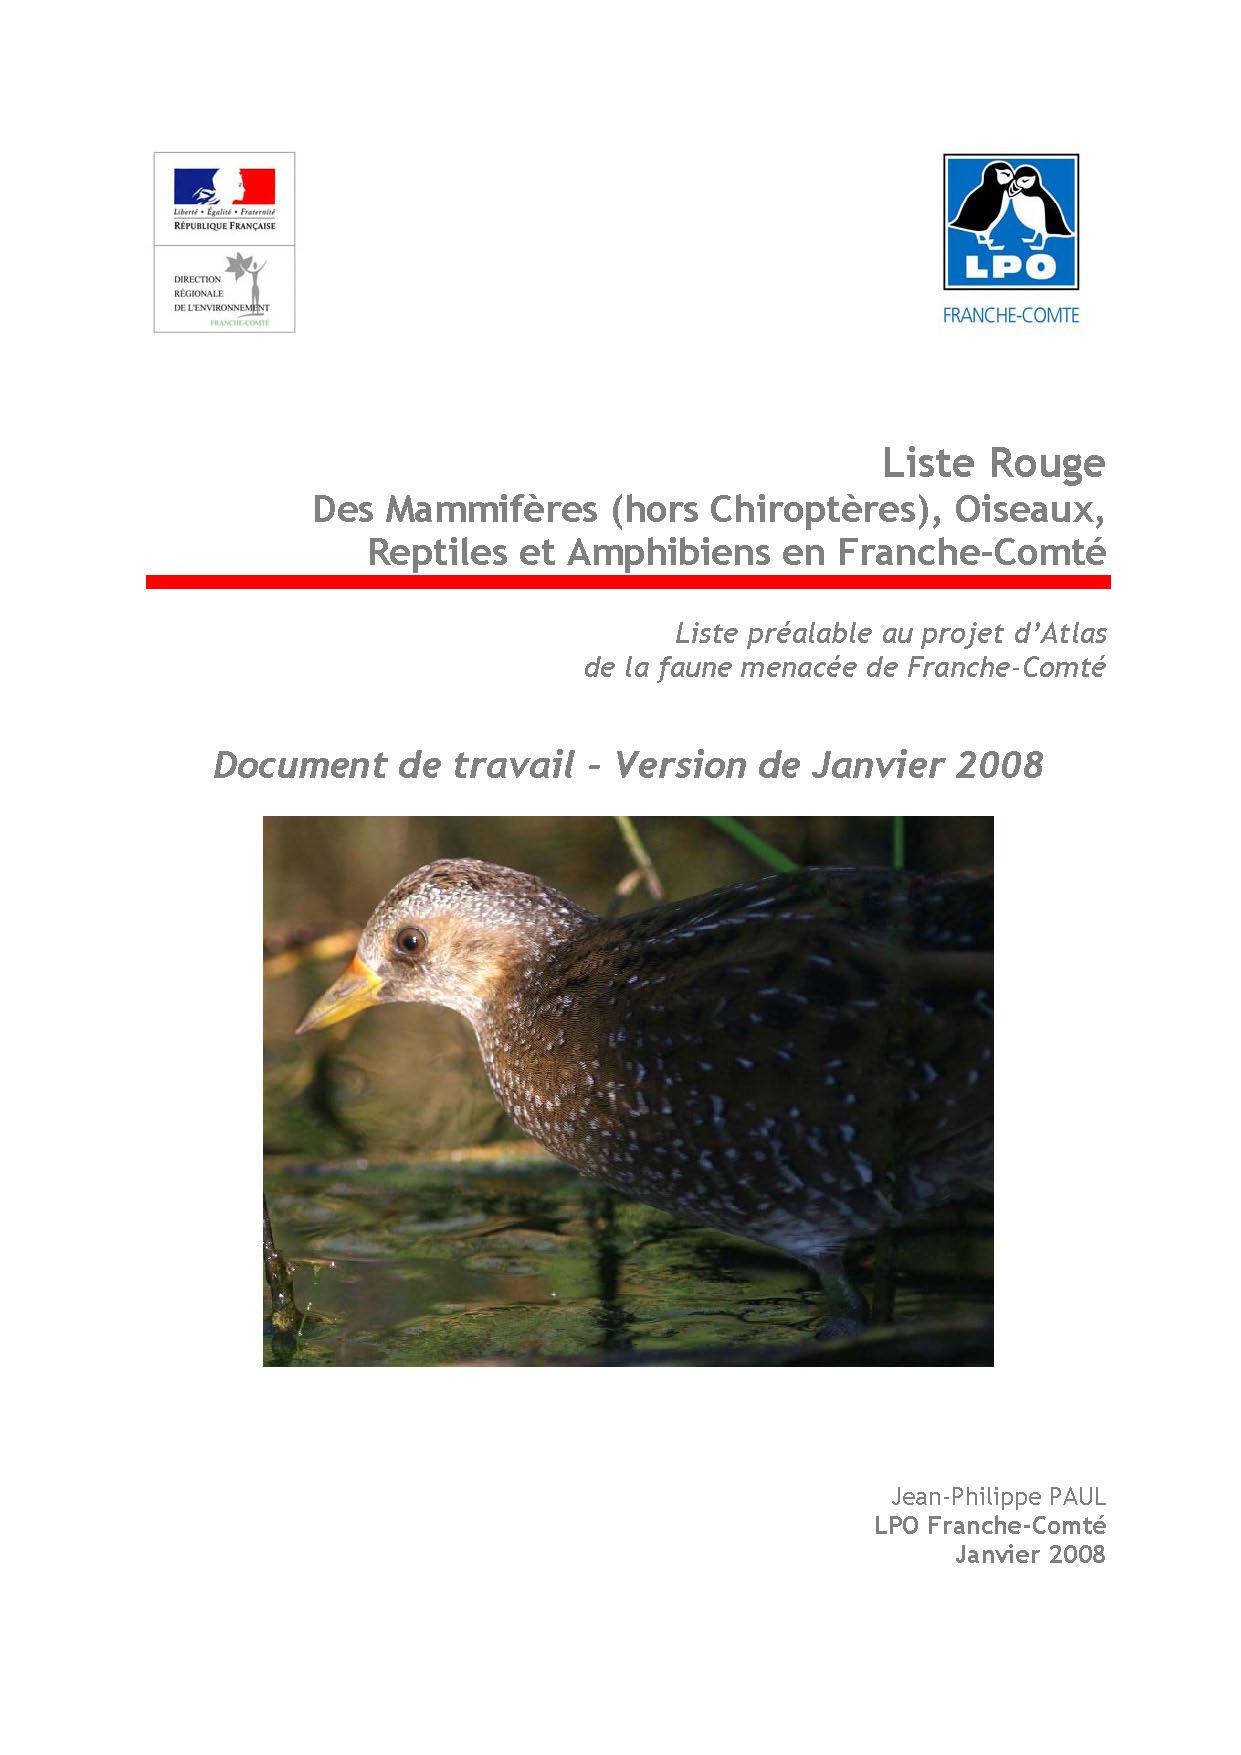 https://cdnfiles2.biolovision.net/franche-comte.lpo.fr/userfiles/proteger/Protectionespces/Liste-rouge-vertebres-terrestres-Franche-Comte-Jan-2008.pdf